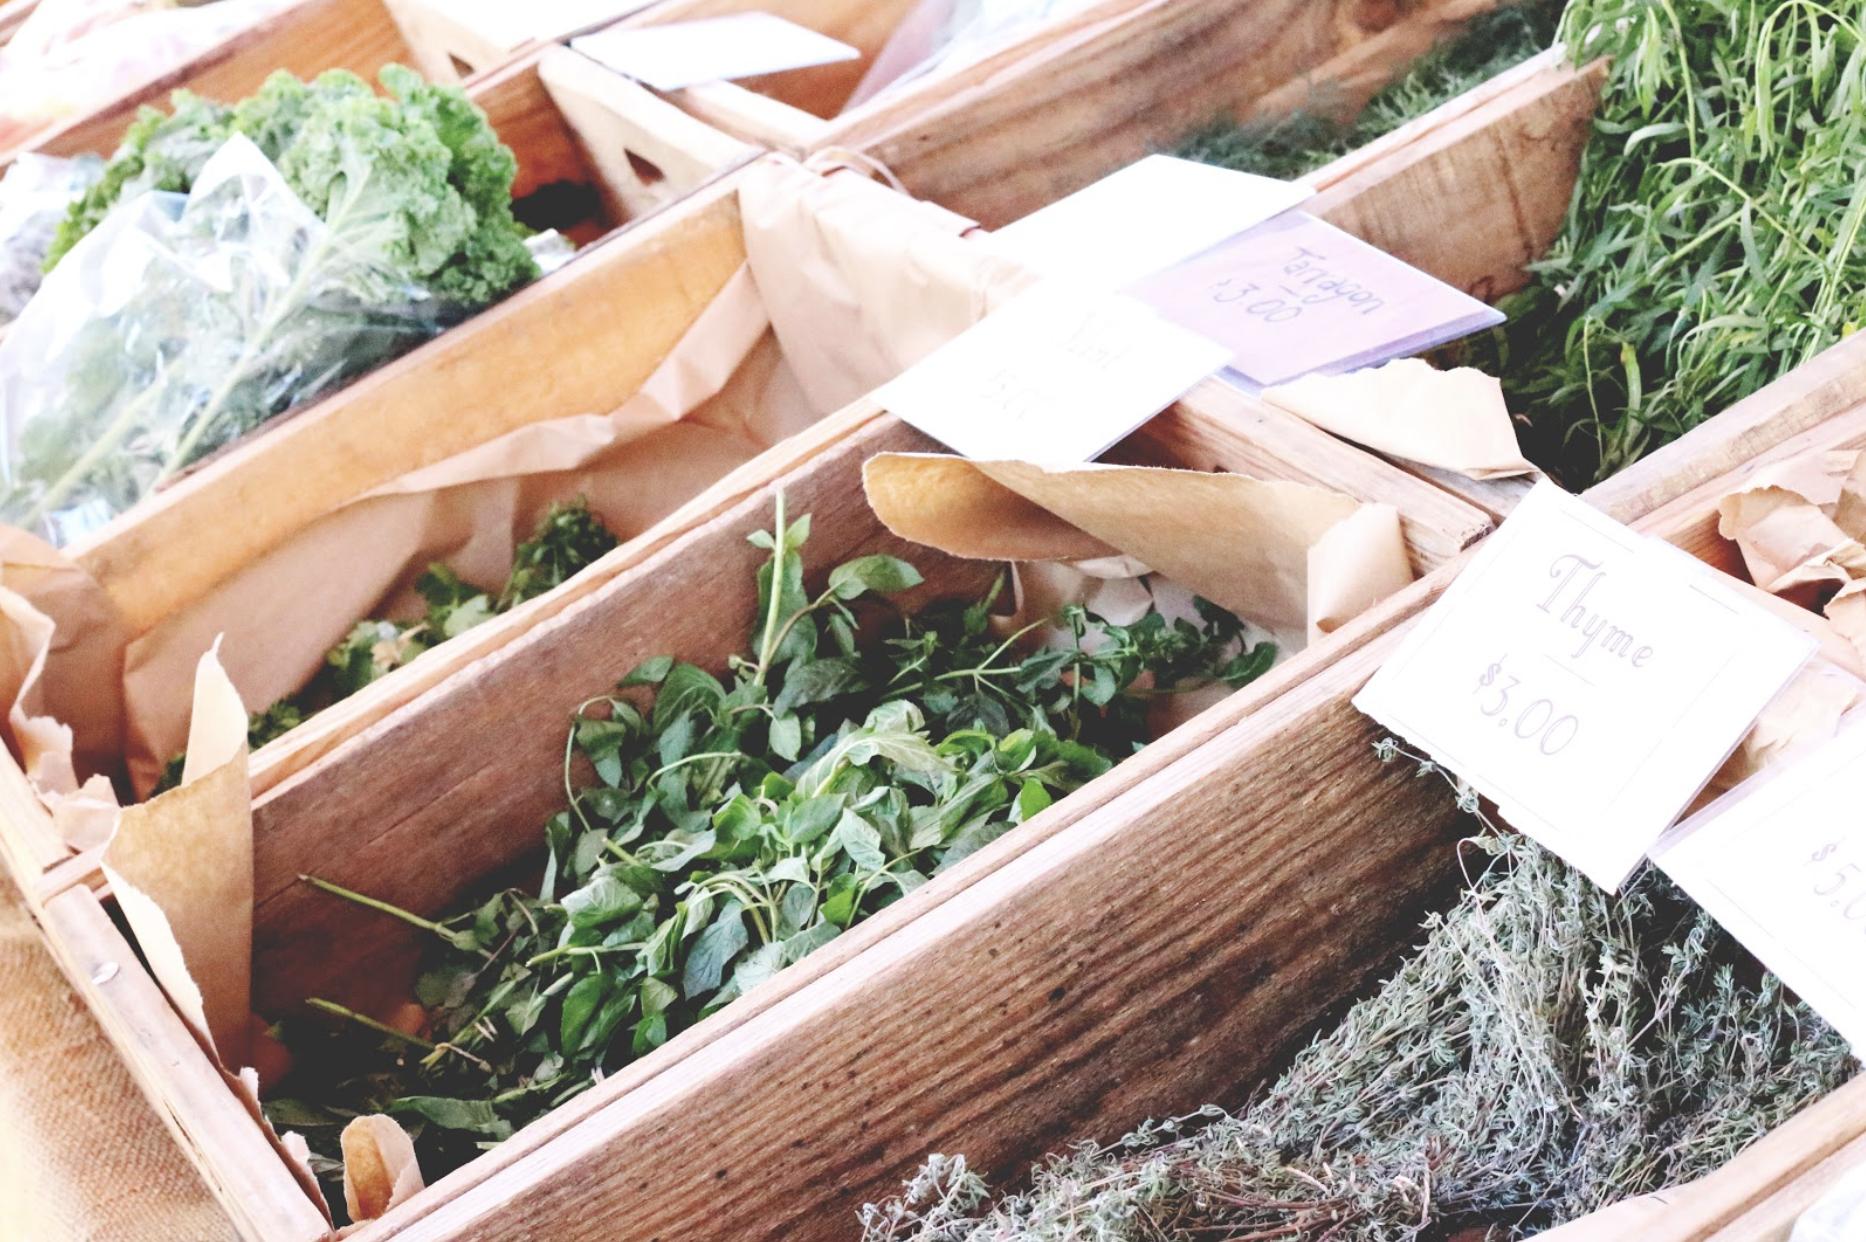 Herbs at the Kelowna Farmers' Market